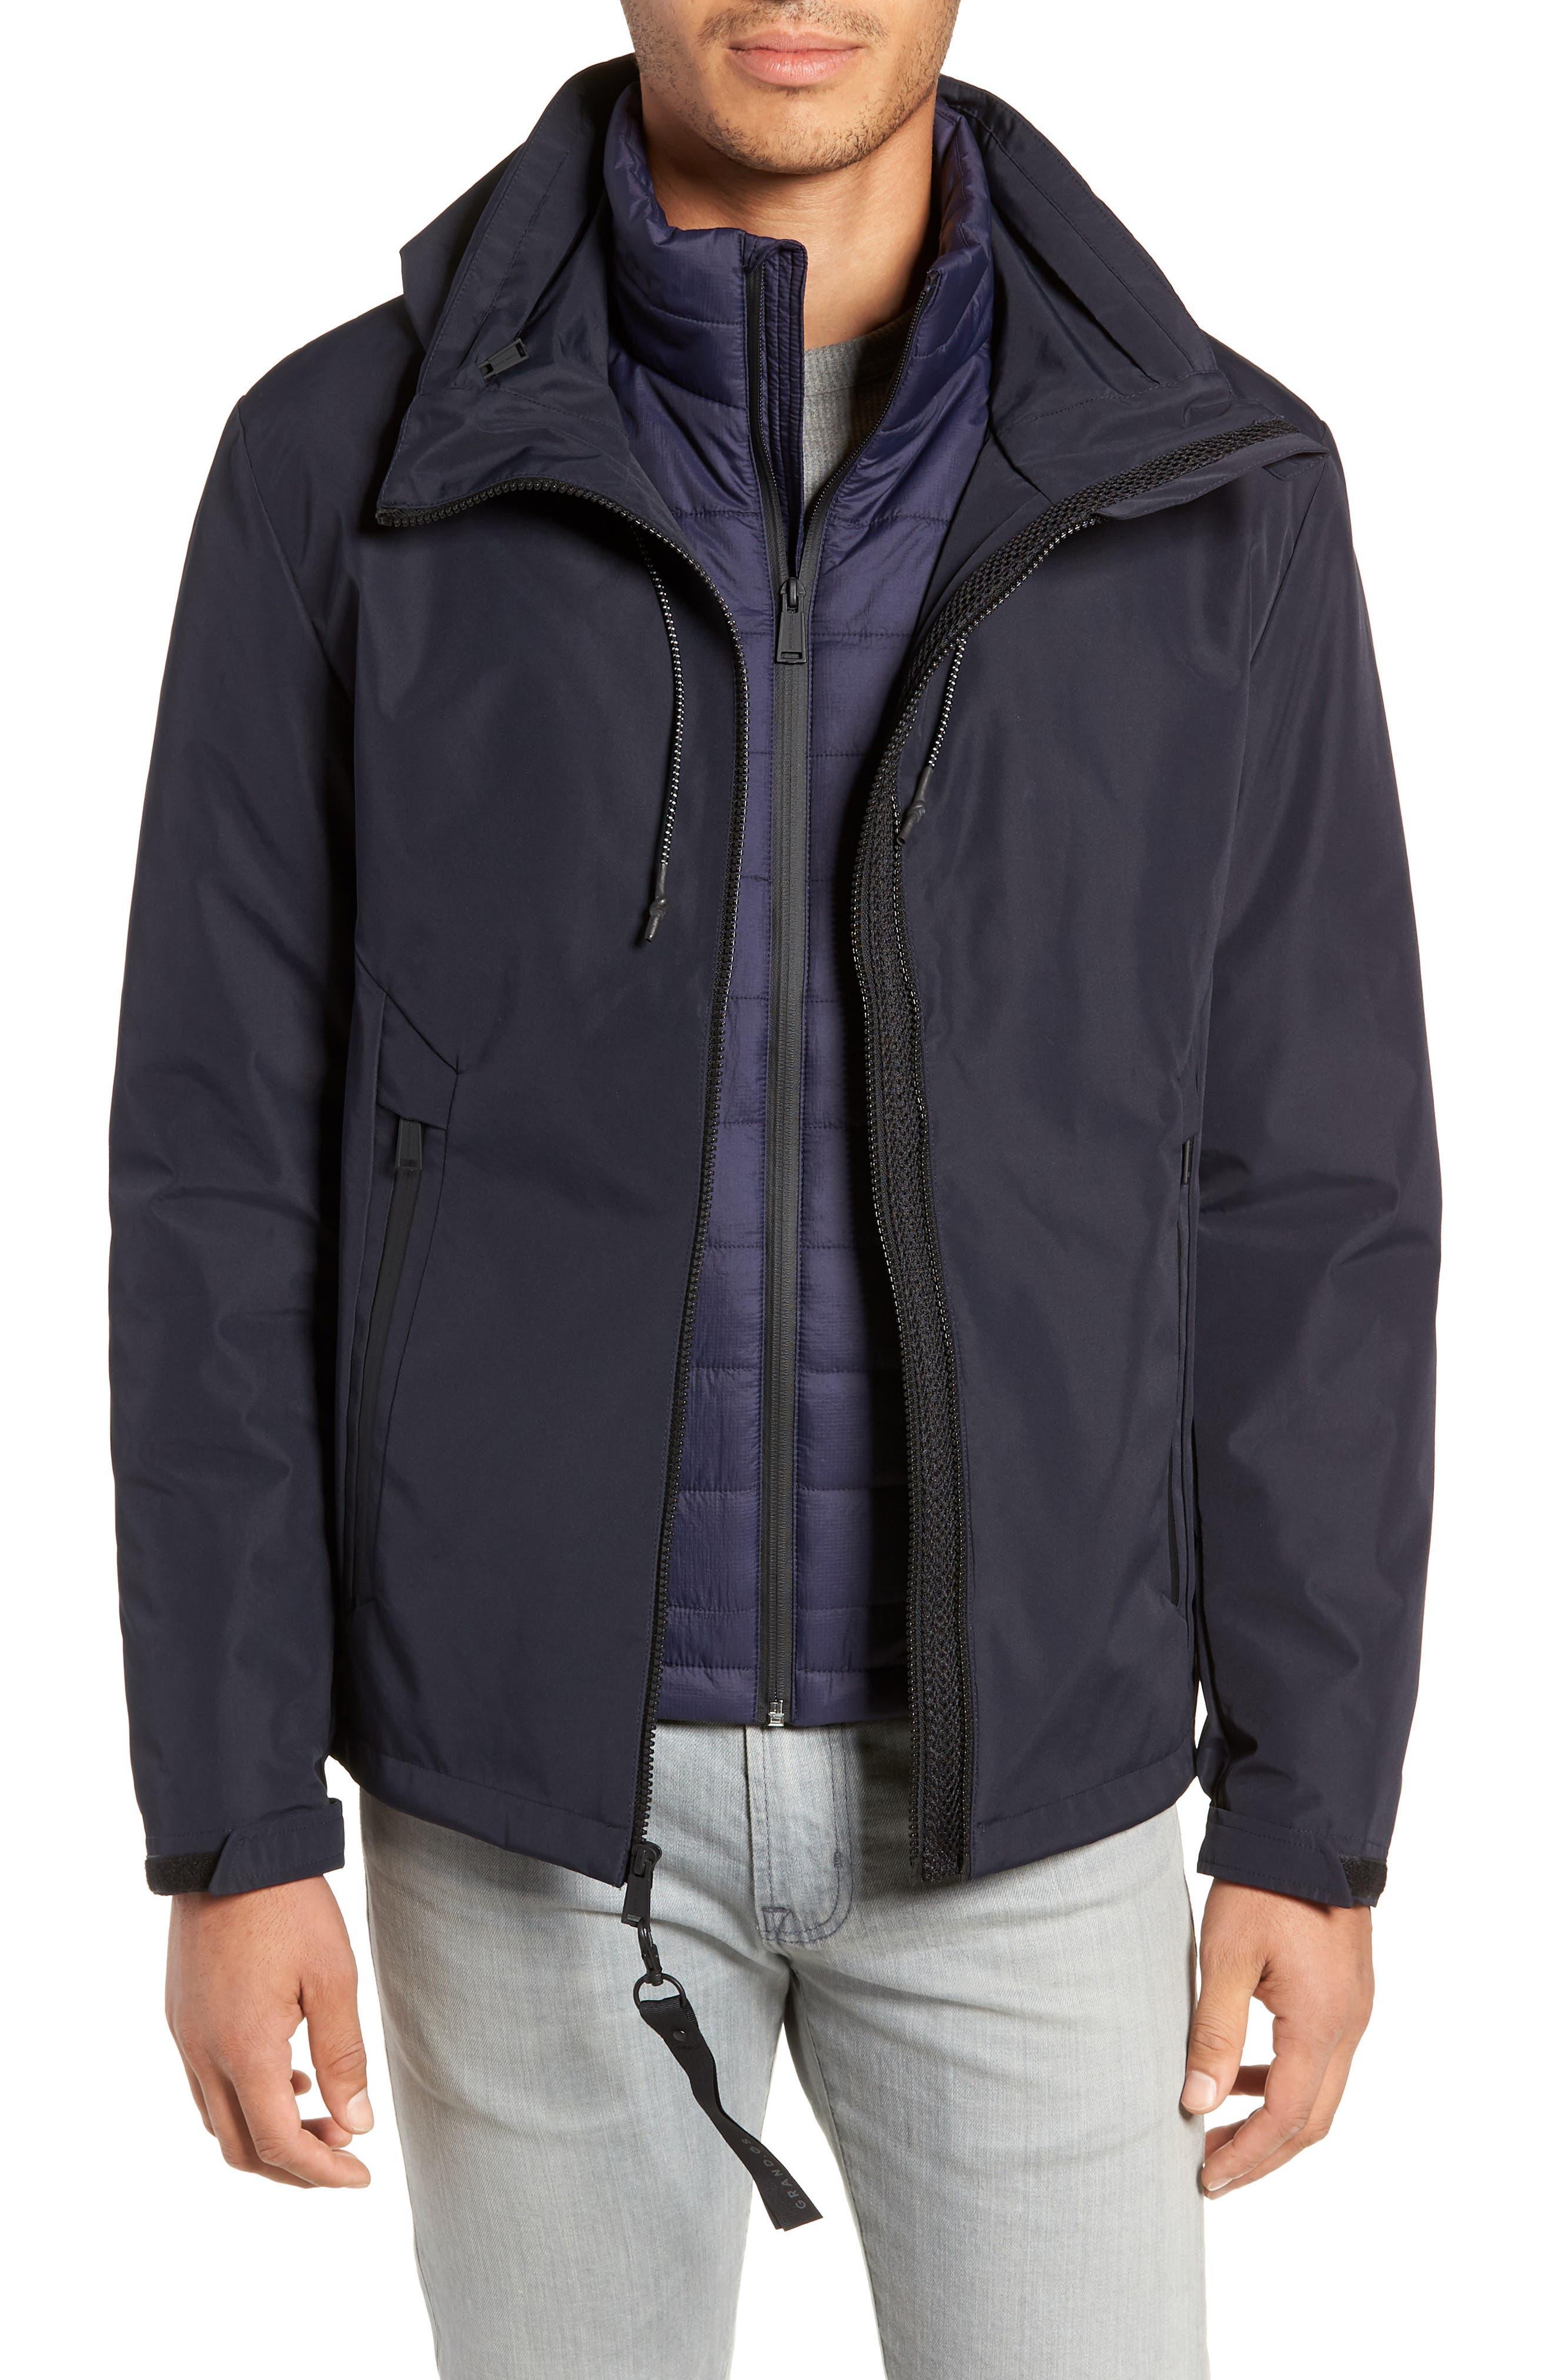 Cole Haan 3-In-1 Rain Jacket, Blue